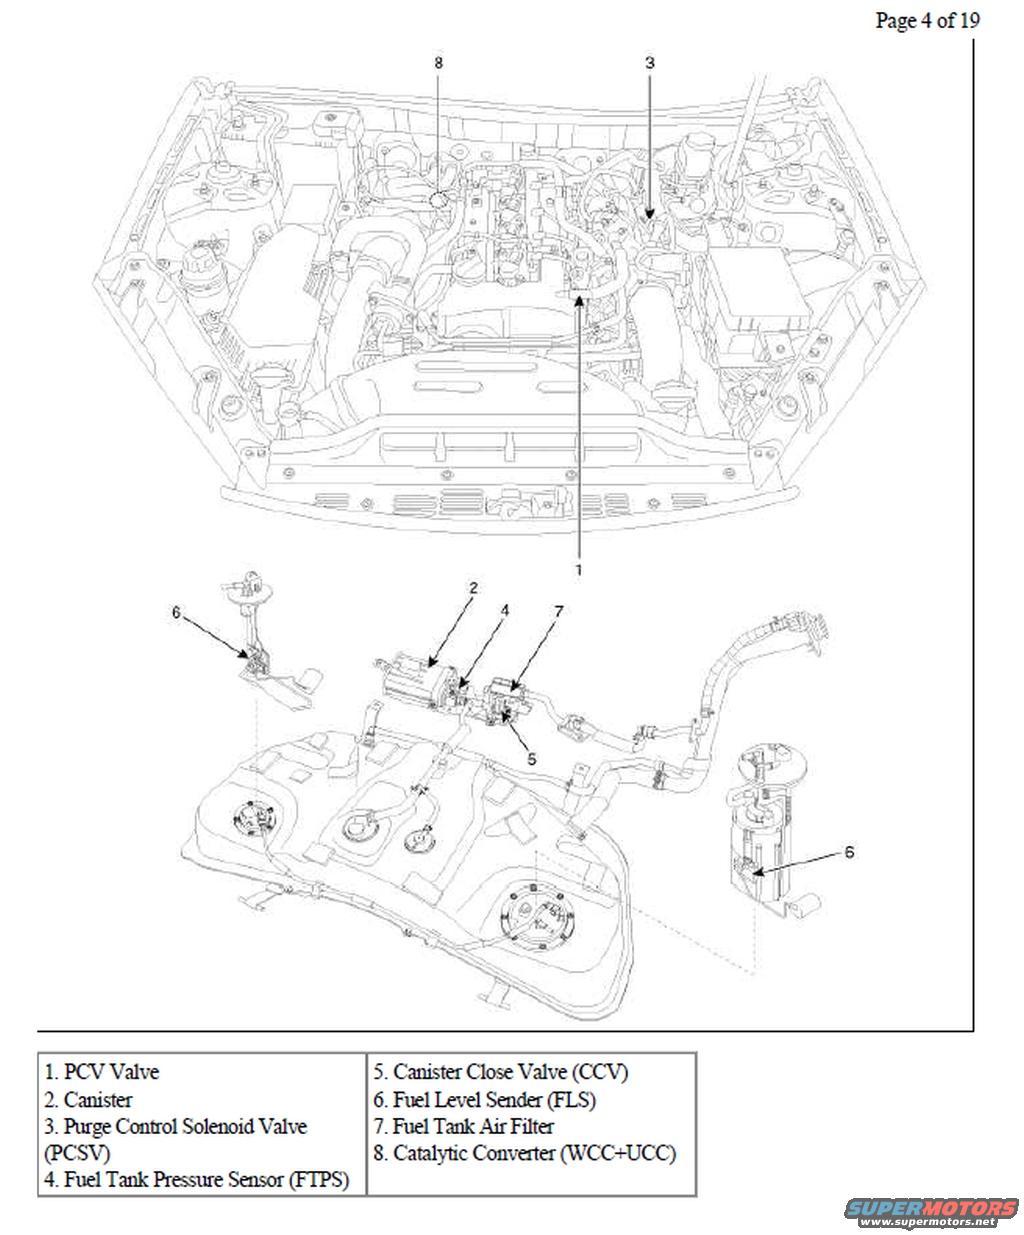 nissan patrol wiring diagram hot rod deville harnes database datsun radio best library kenworth harness